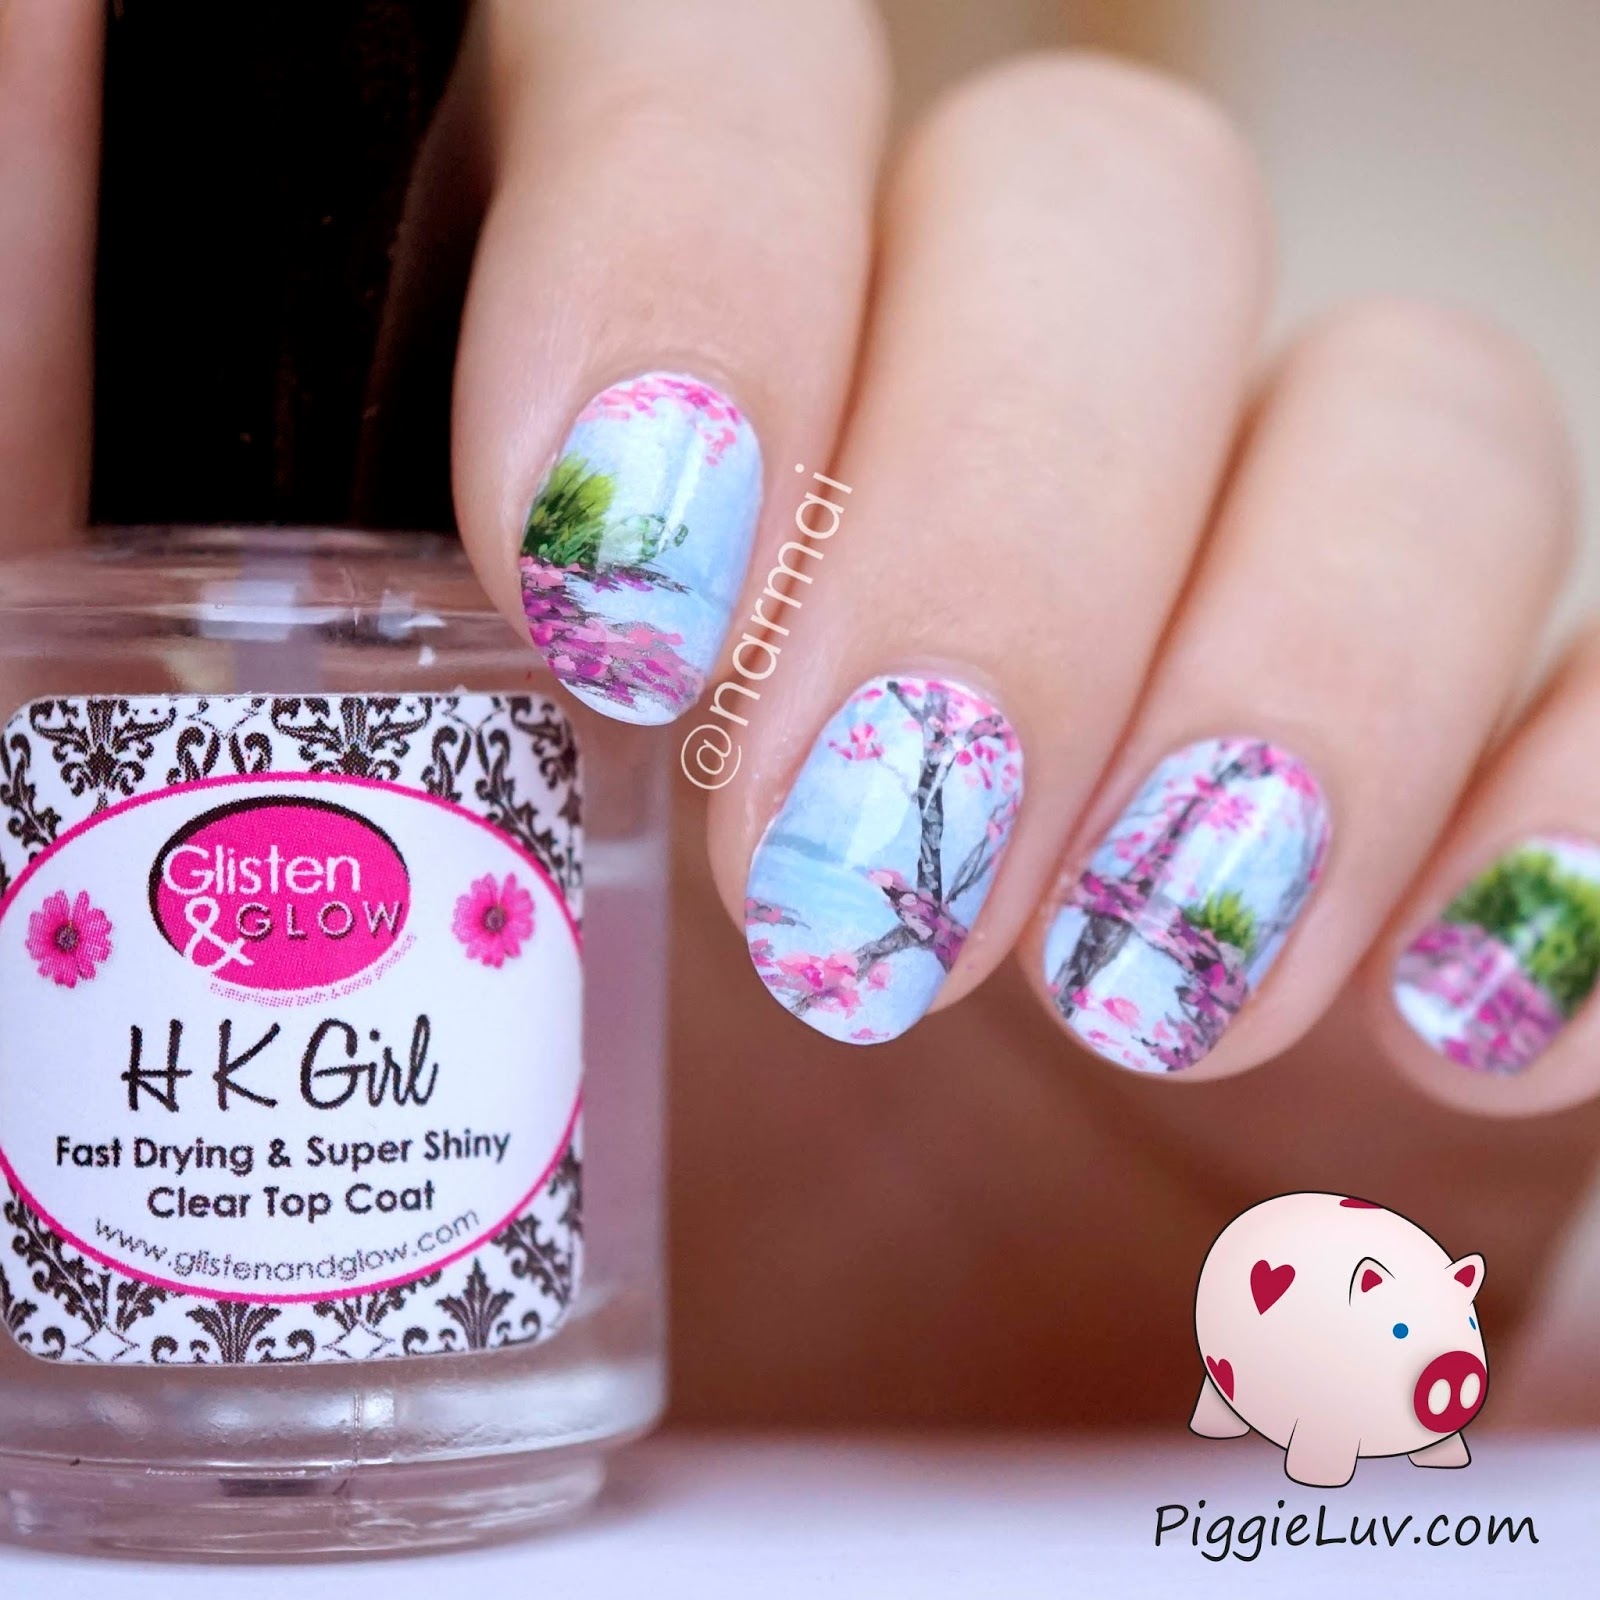 PiggieLuv: Freehand blossoms landscape nail art